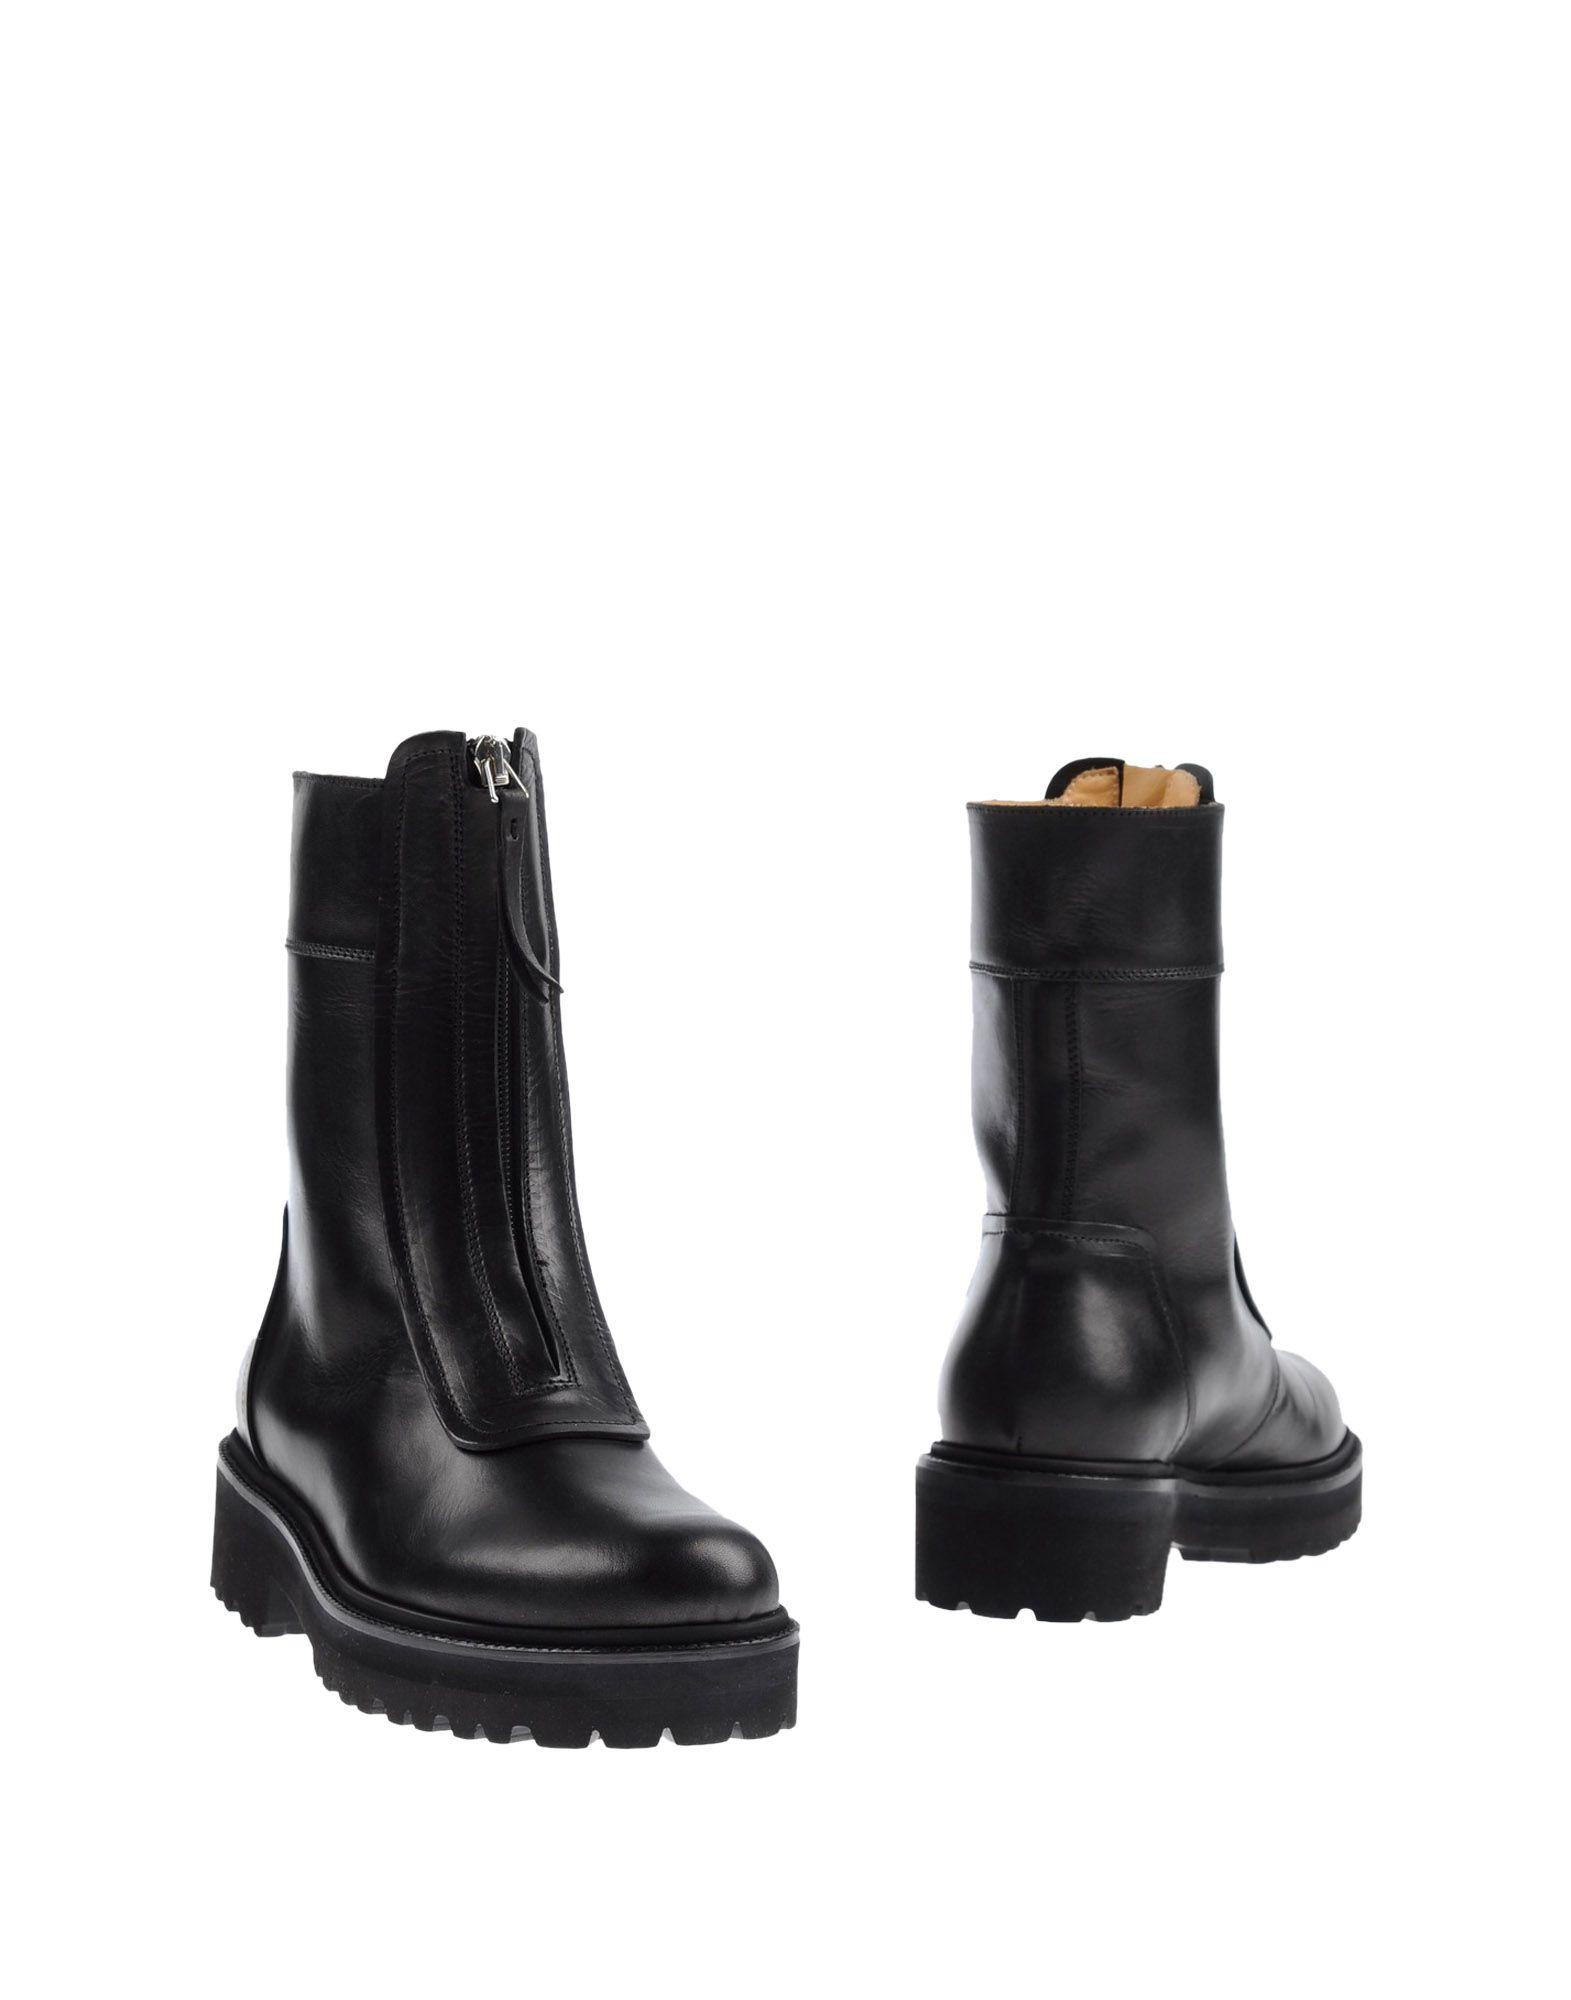 Mm6 Maison Margiela Stiefelette Damen Schuhe  11028195VDGünstige gut aussehende Schuhe Damen 5d0e55